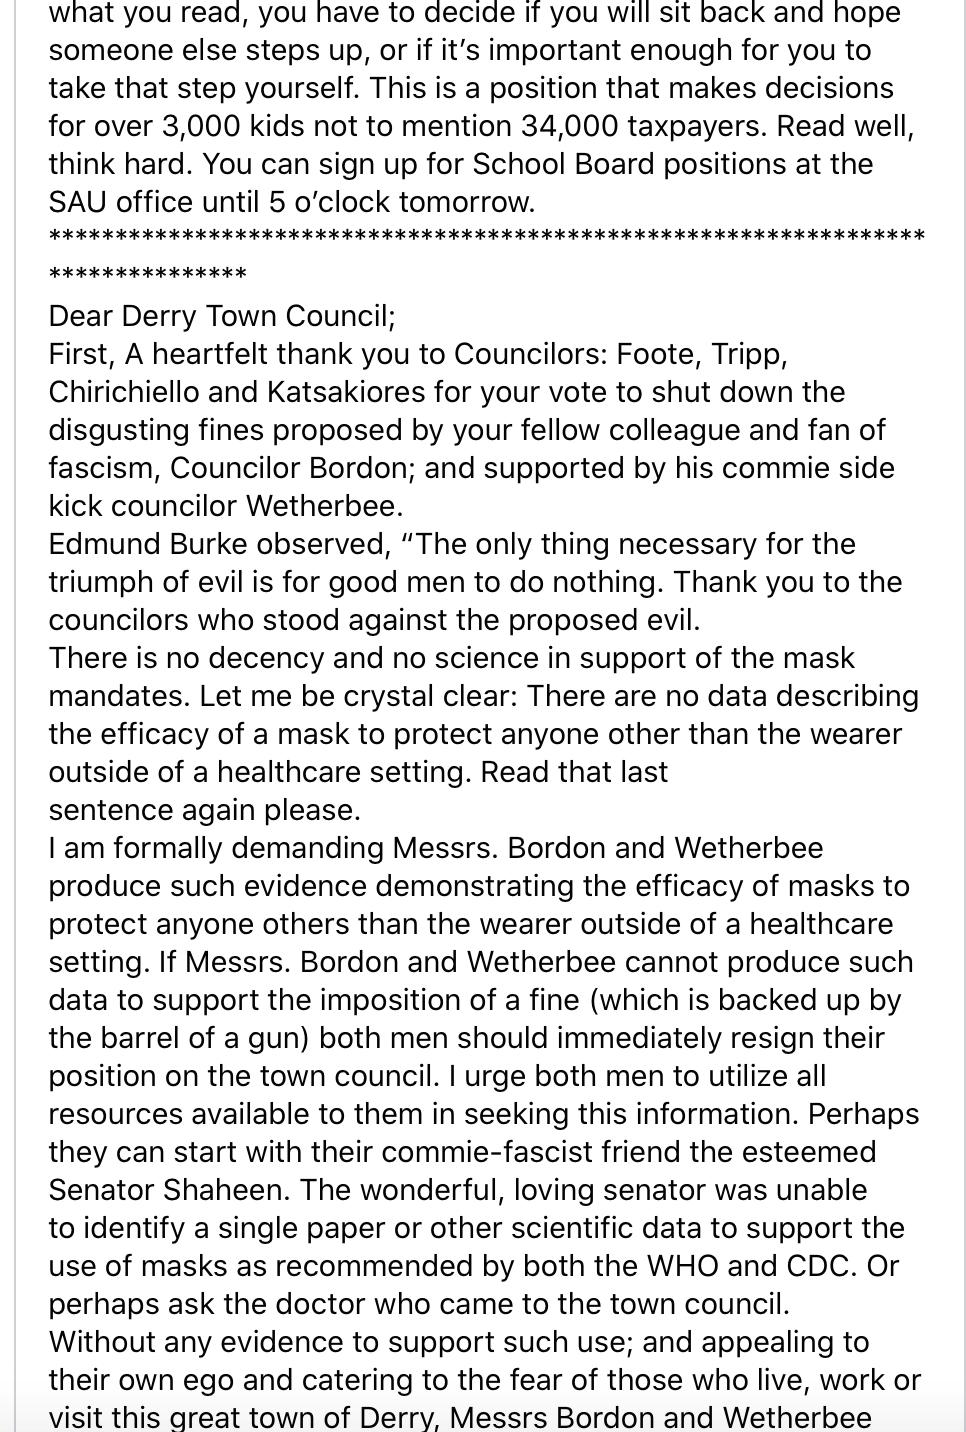 wetherbee mask mandate two